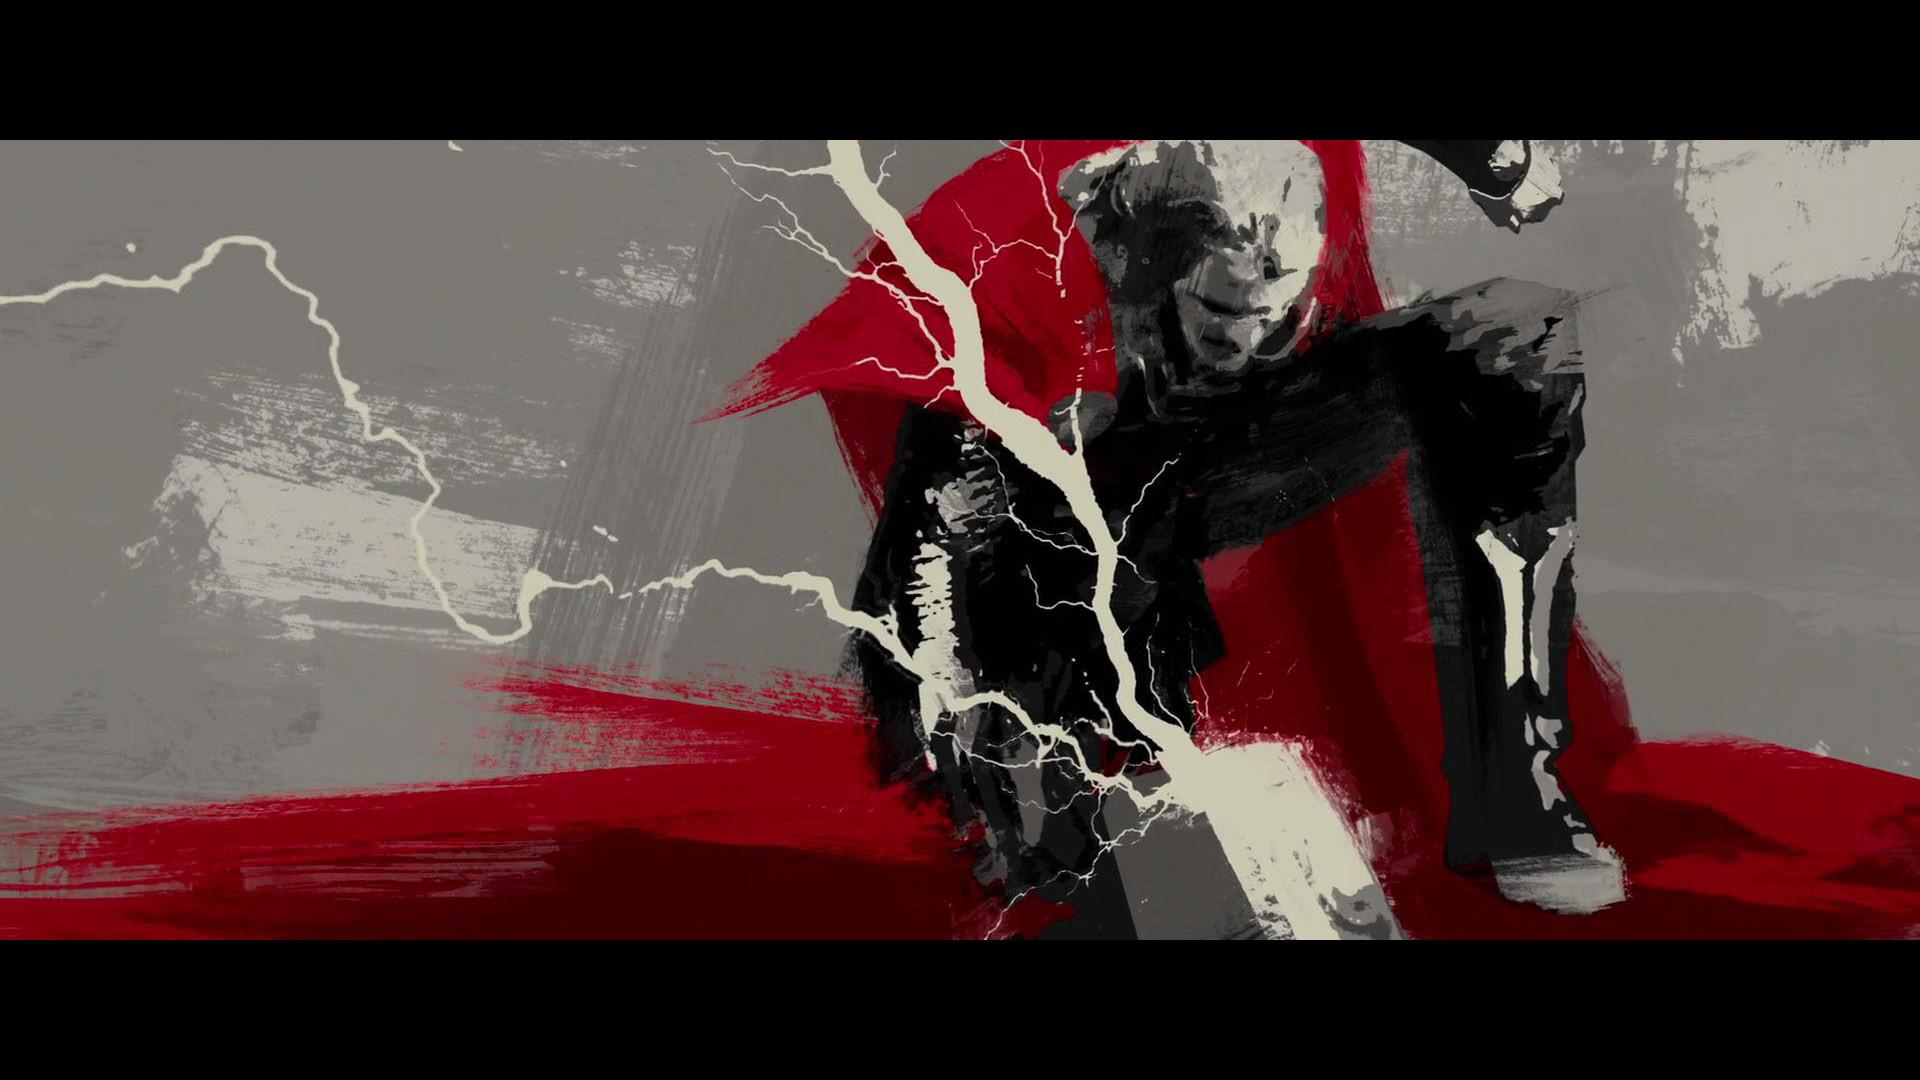 Res: 1920x1080, Thor Wallpaper